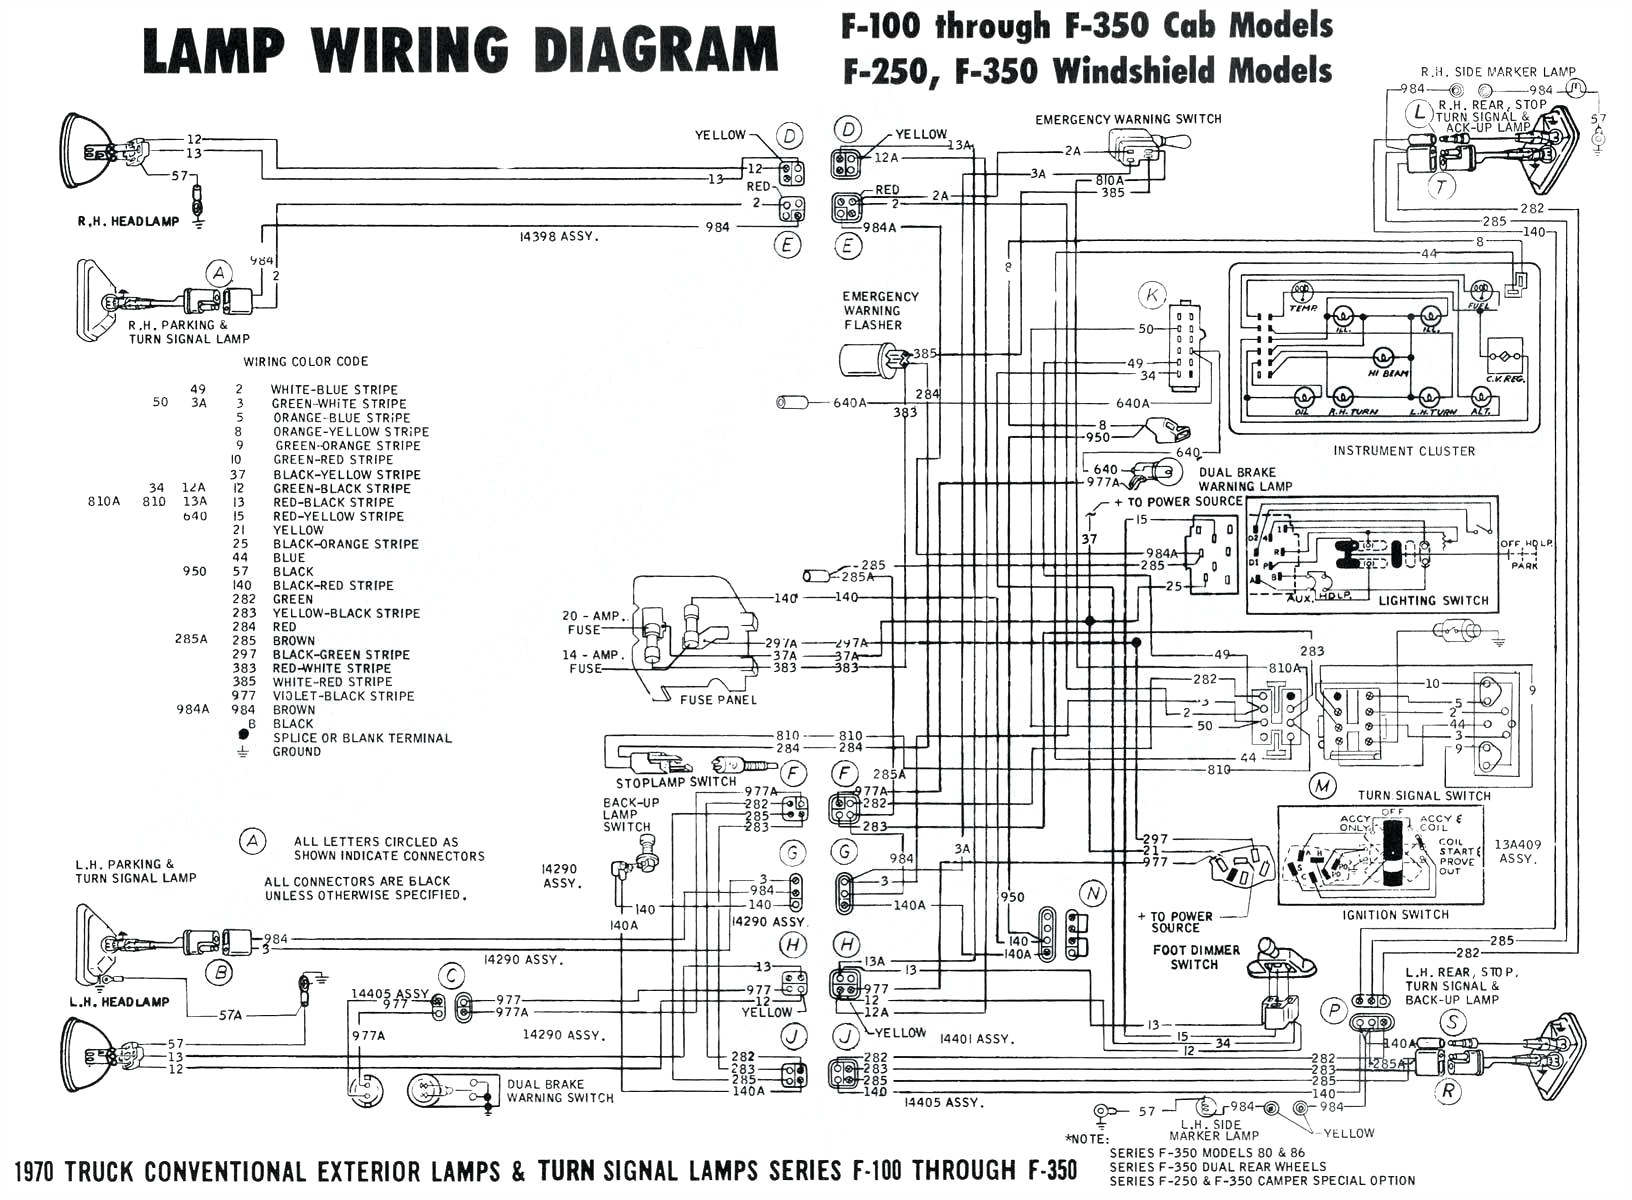 1az ecm wire diagram electrical schematic wiring diagram 1az ecm wire diagram 2003